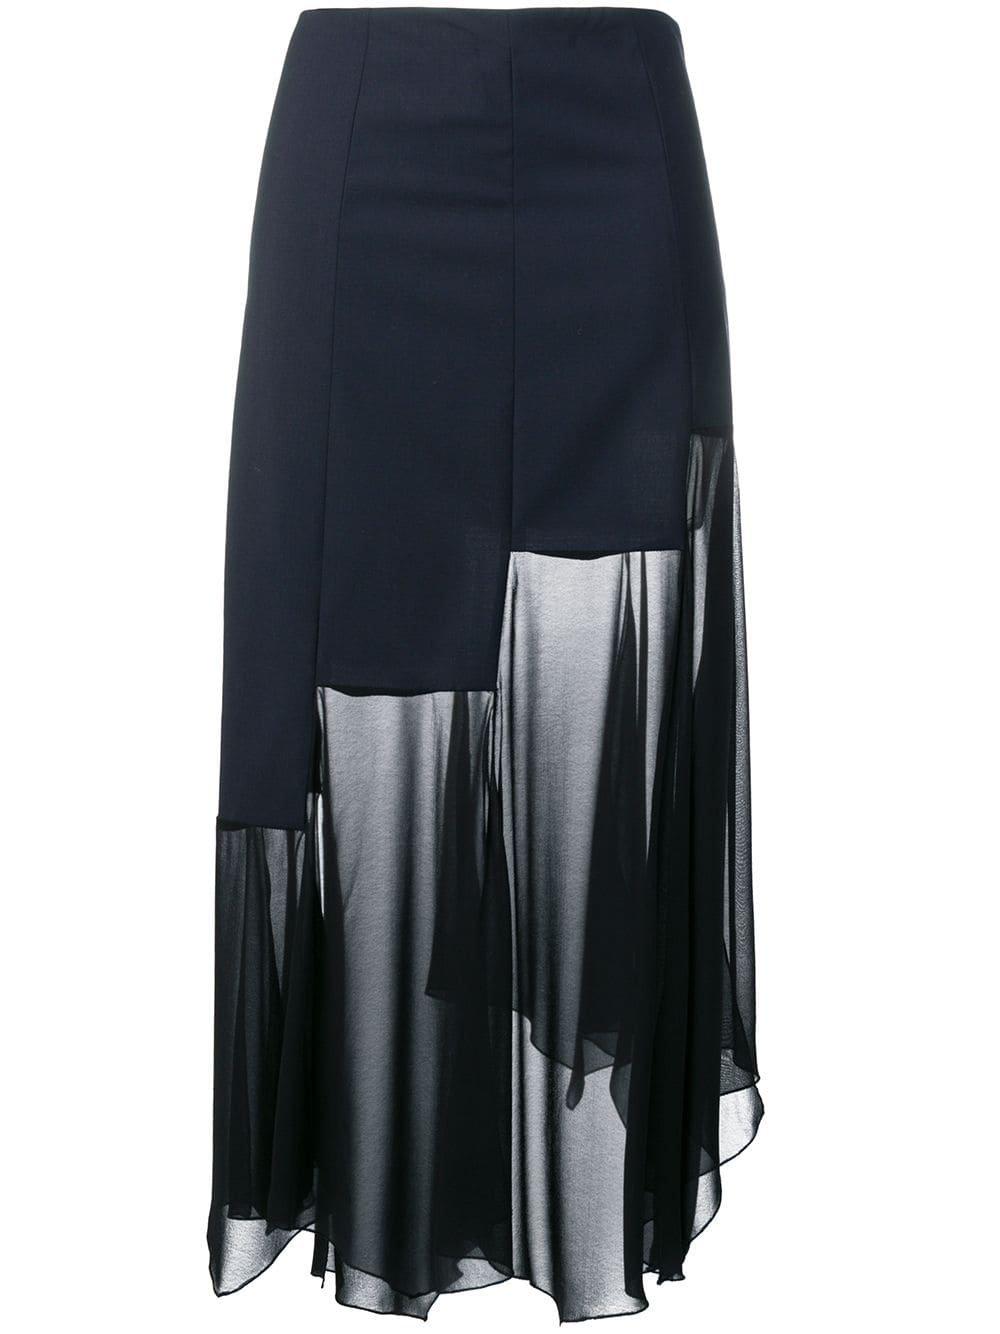 Sonia Rykiel Sheer Panel Skirt - Farfetch